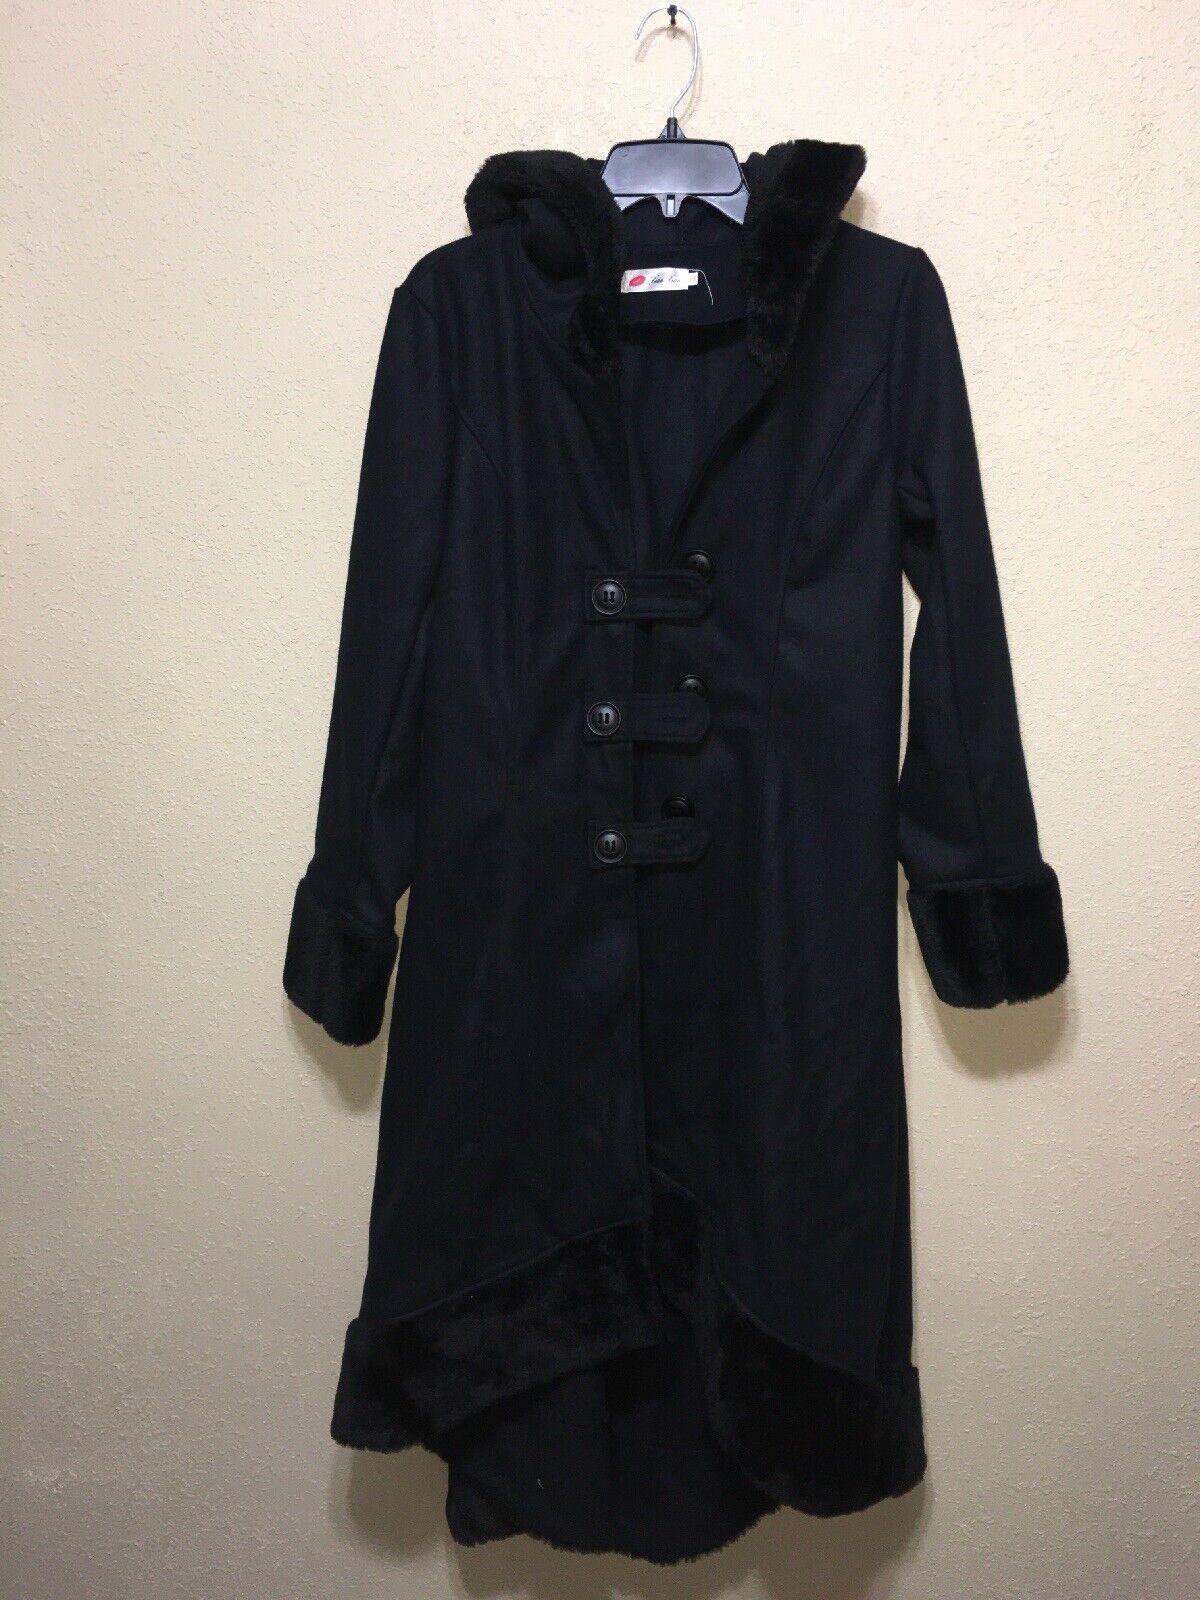 Xian Xian Gothic Black Hooded Jacket Coat Womens Button Up SZ XXL New